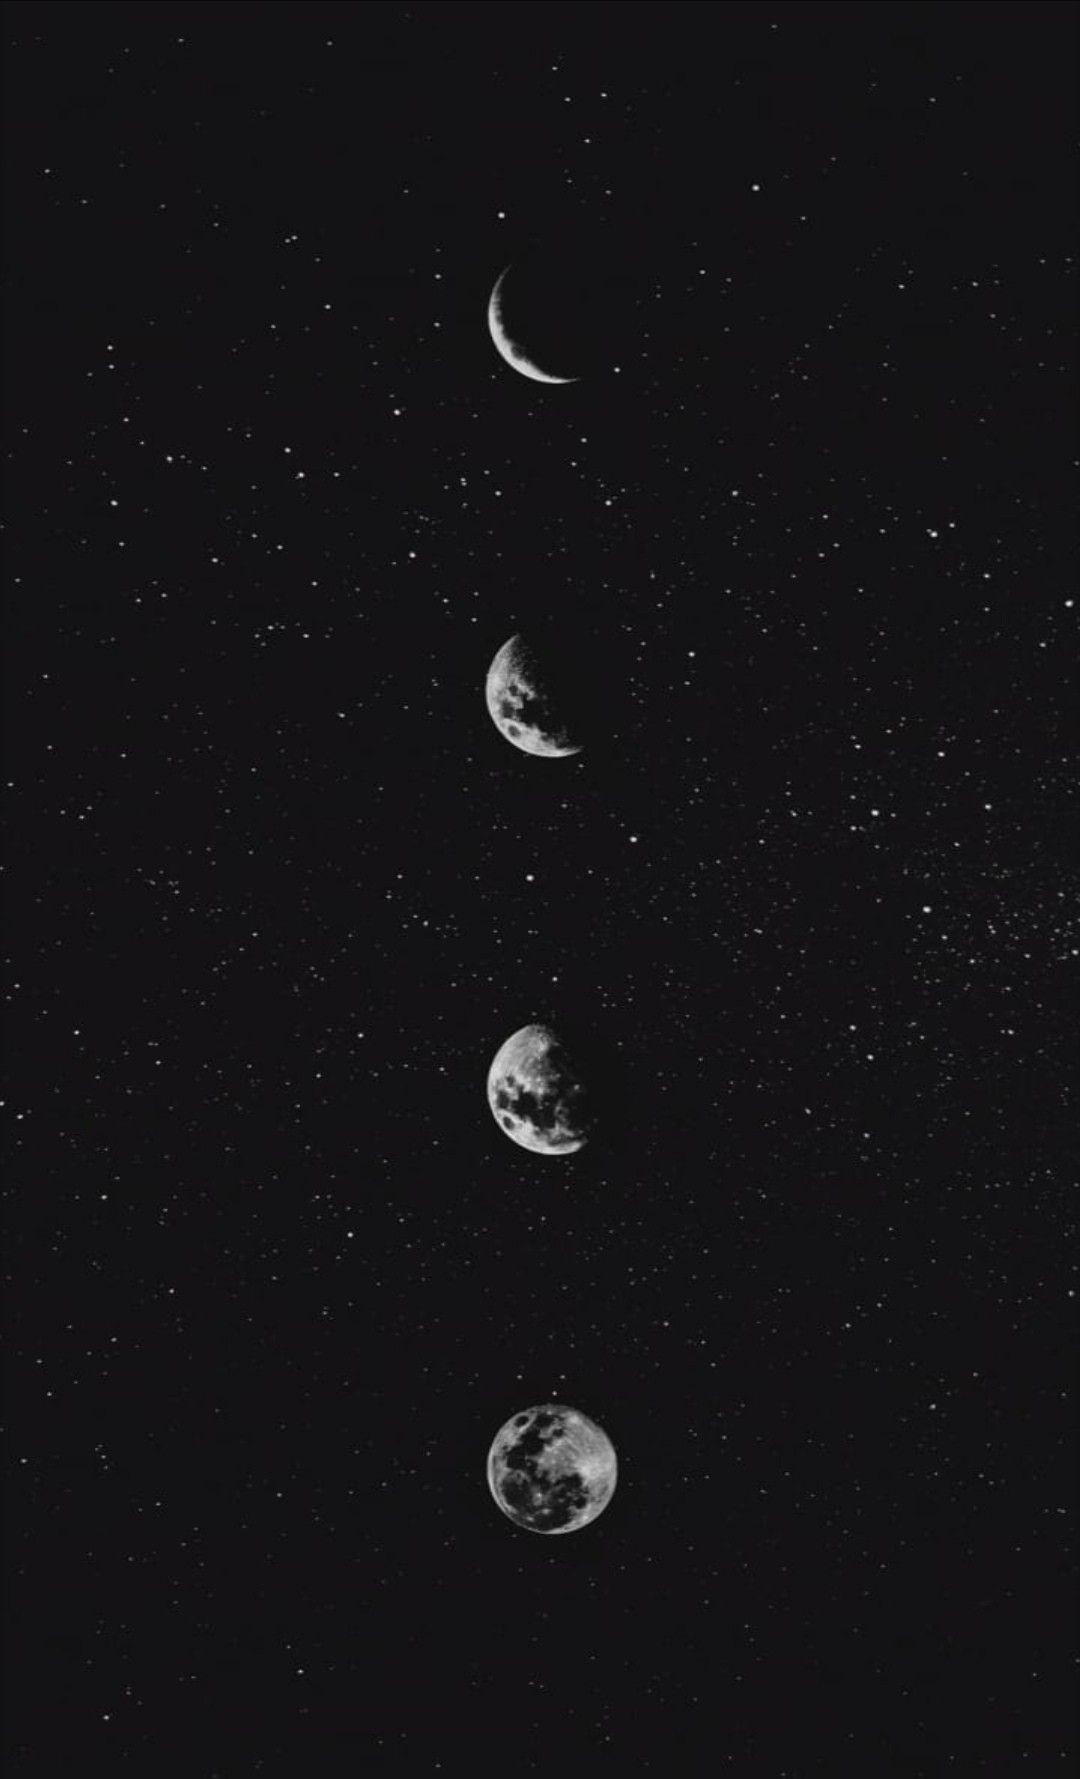 Moon Image By Indah Kwati